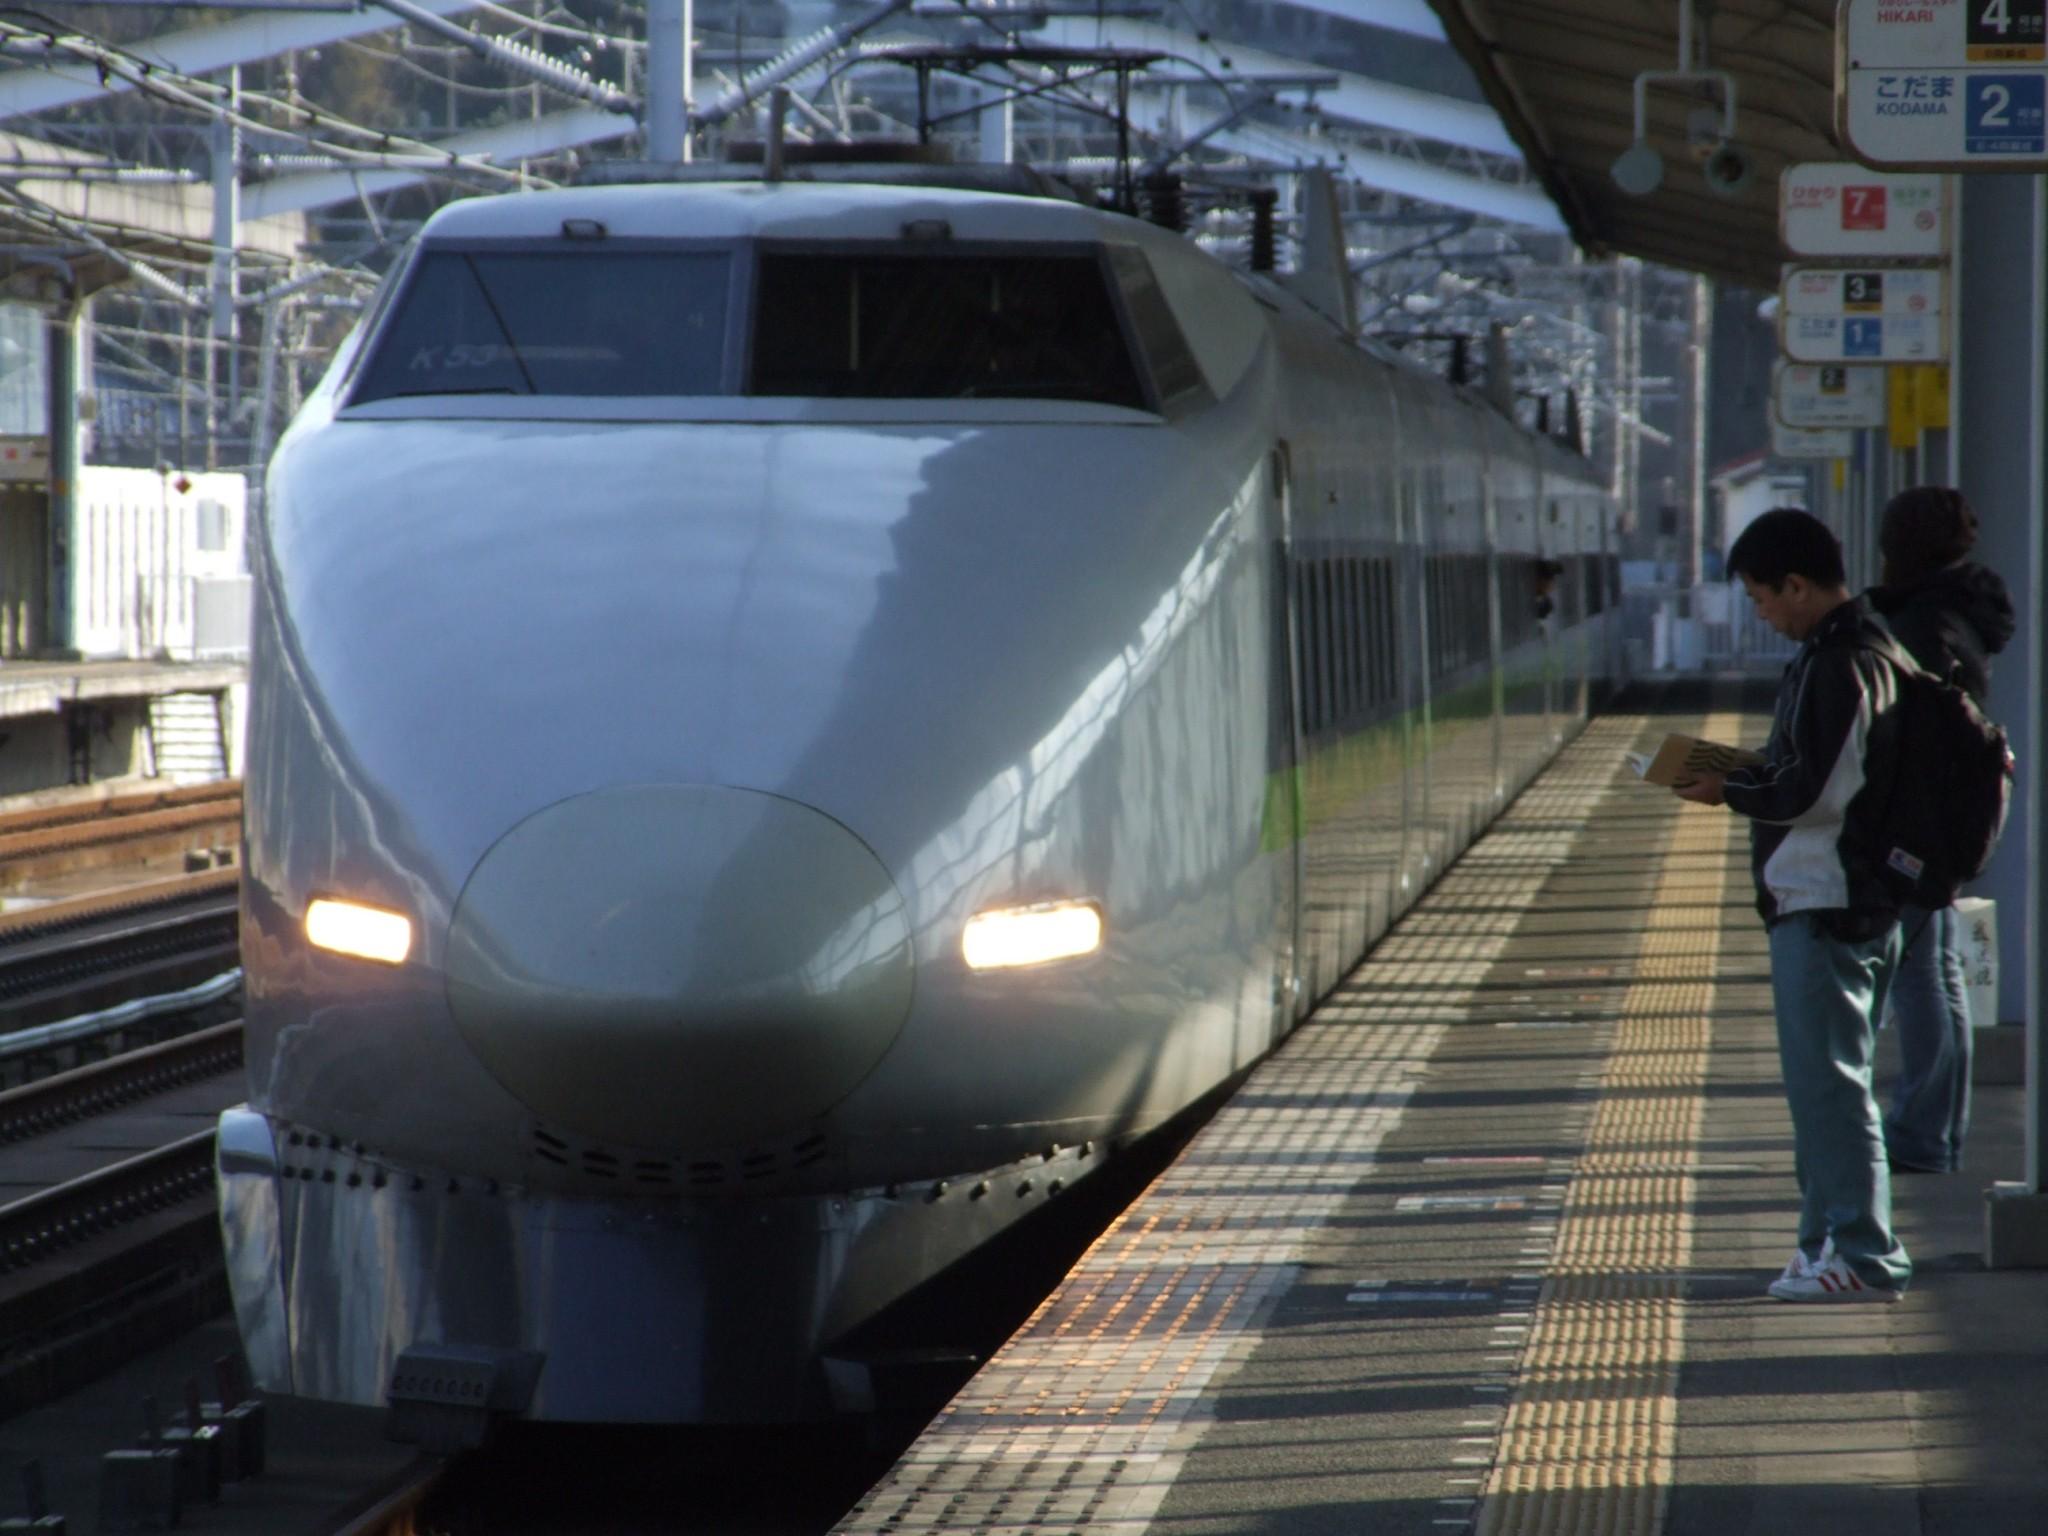 Tips For Riding the Shinkansen (Bullet train) in Japan